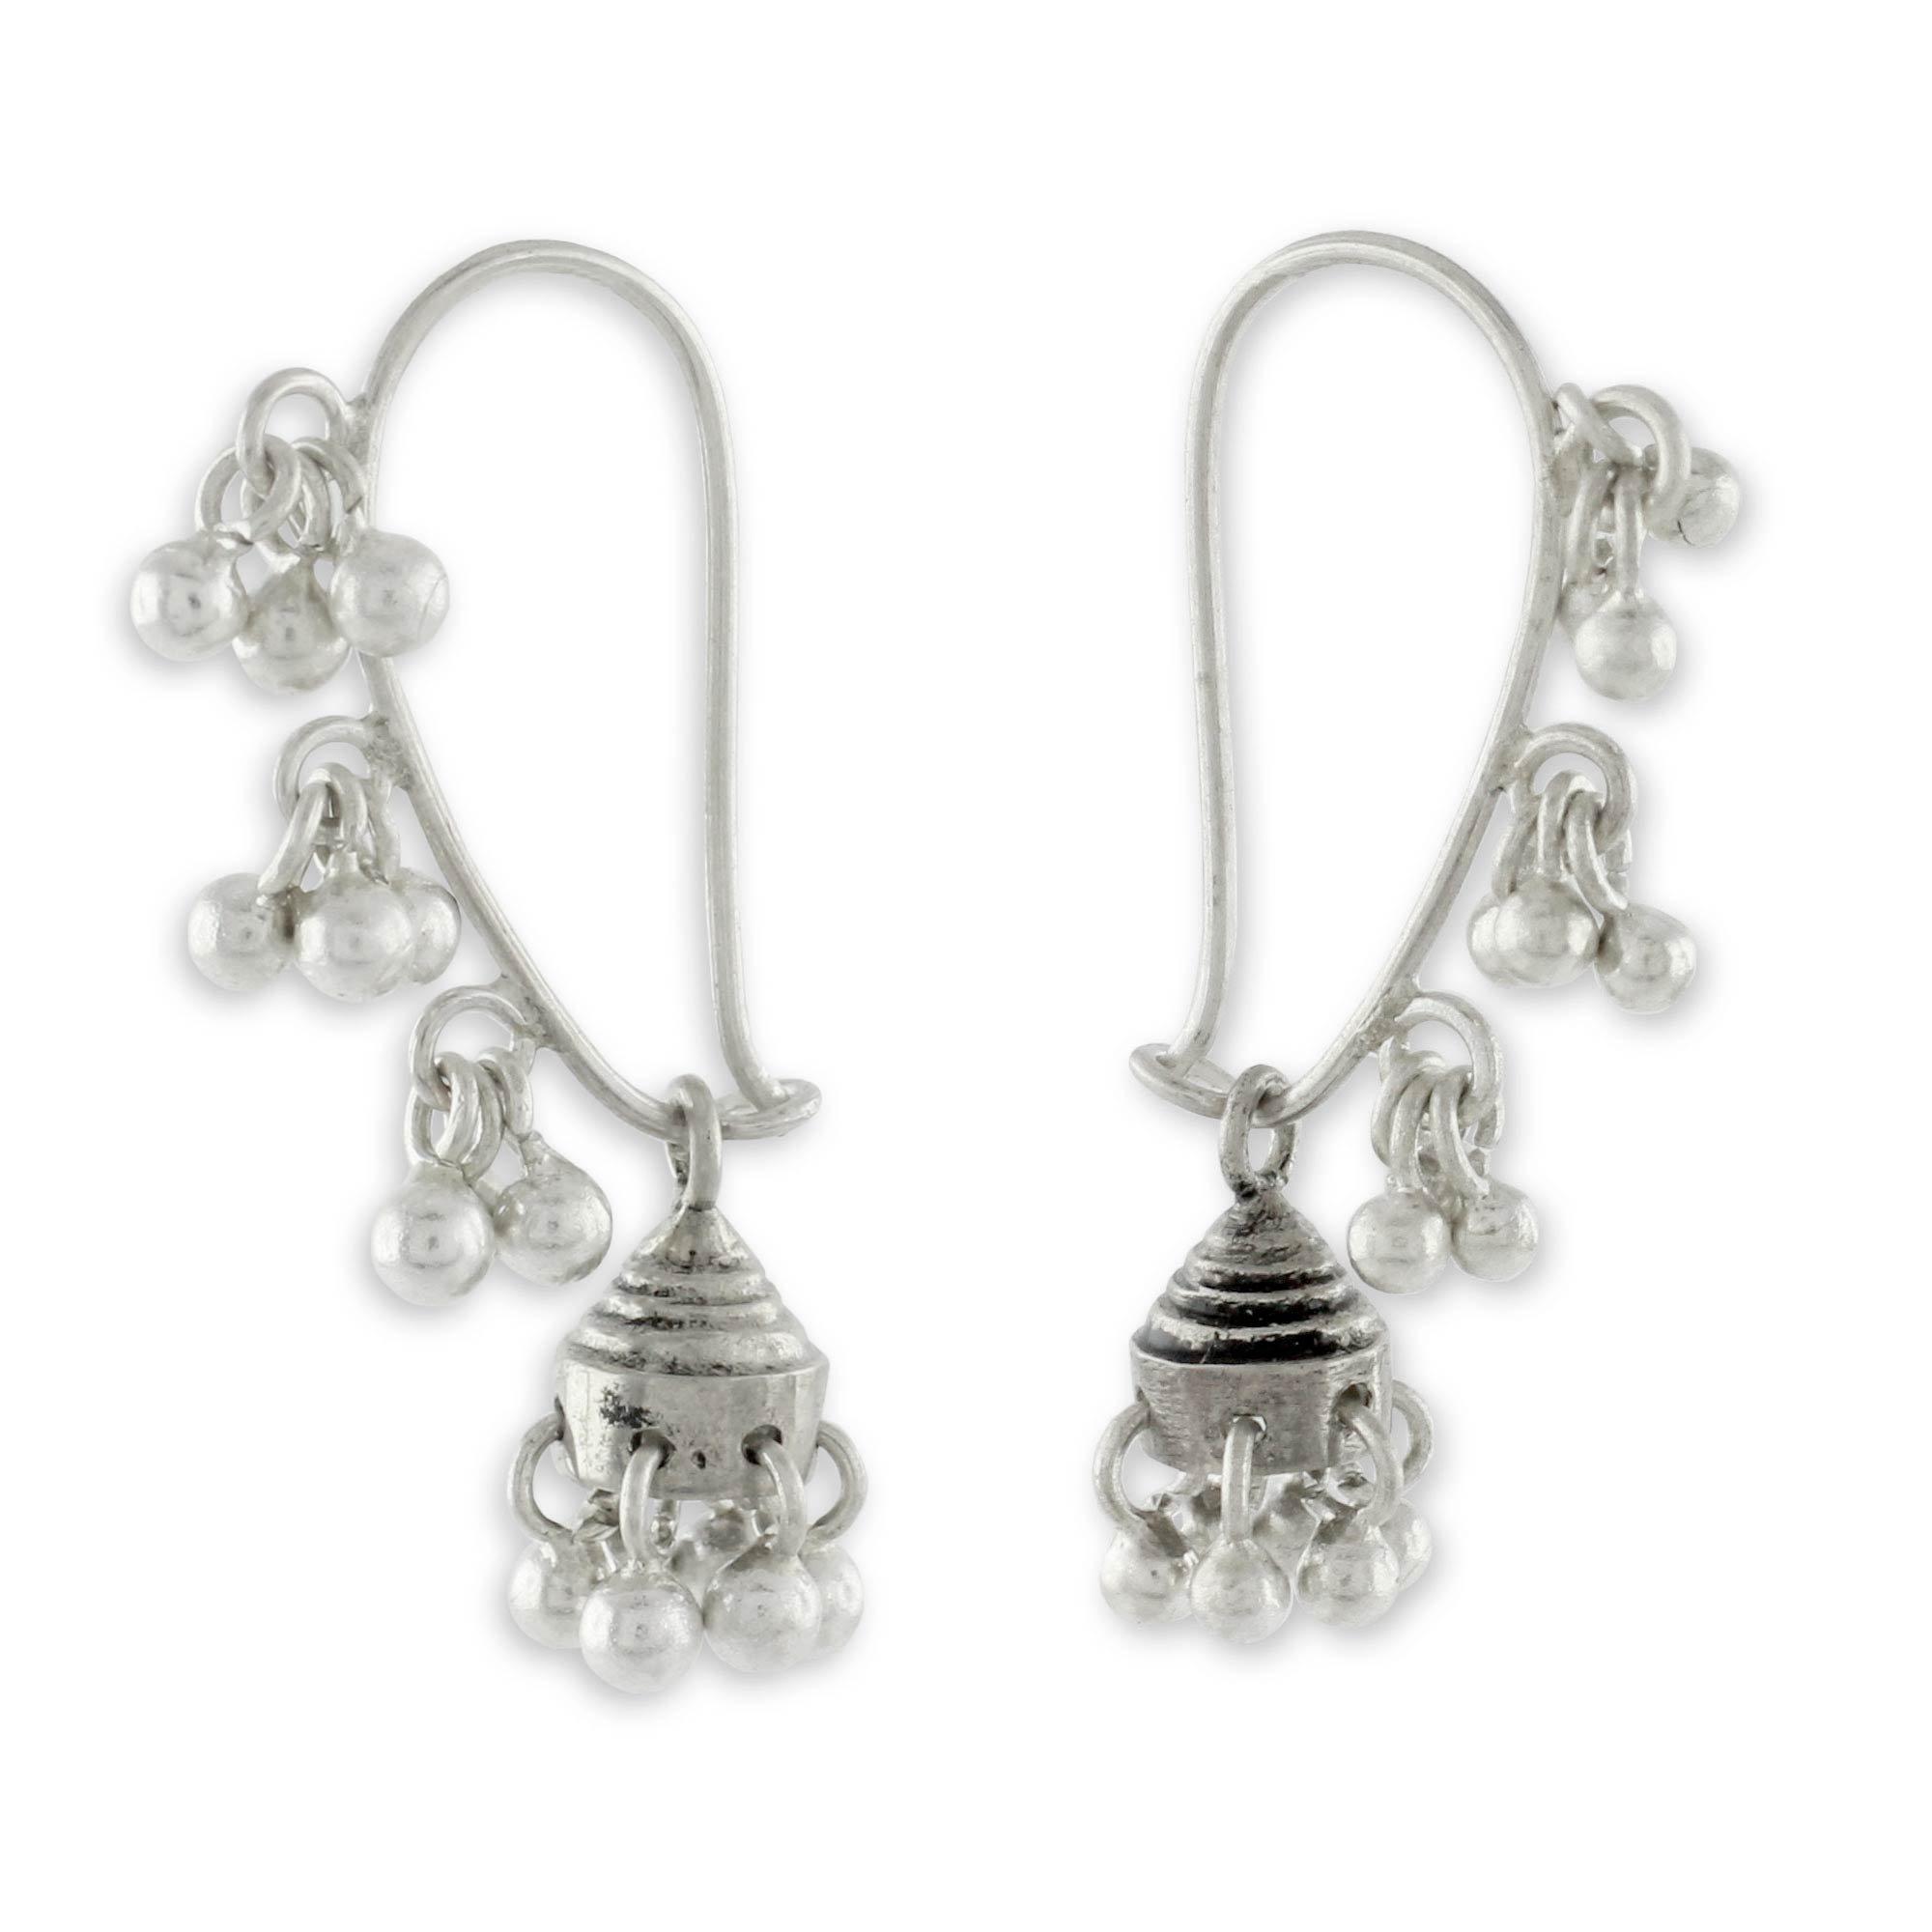 NOVICA .925 Sterling Silver Jhumki Style Jingle Bell Dangle Earrings, Music'